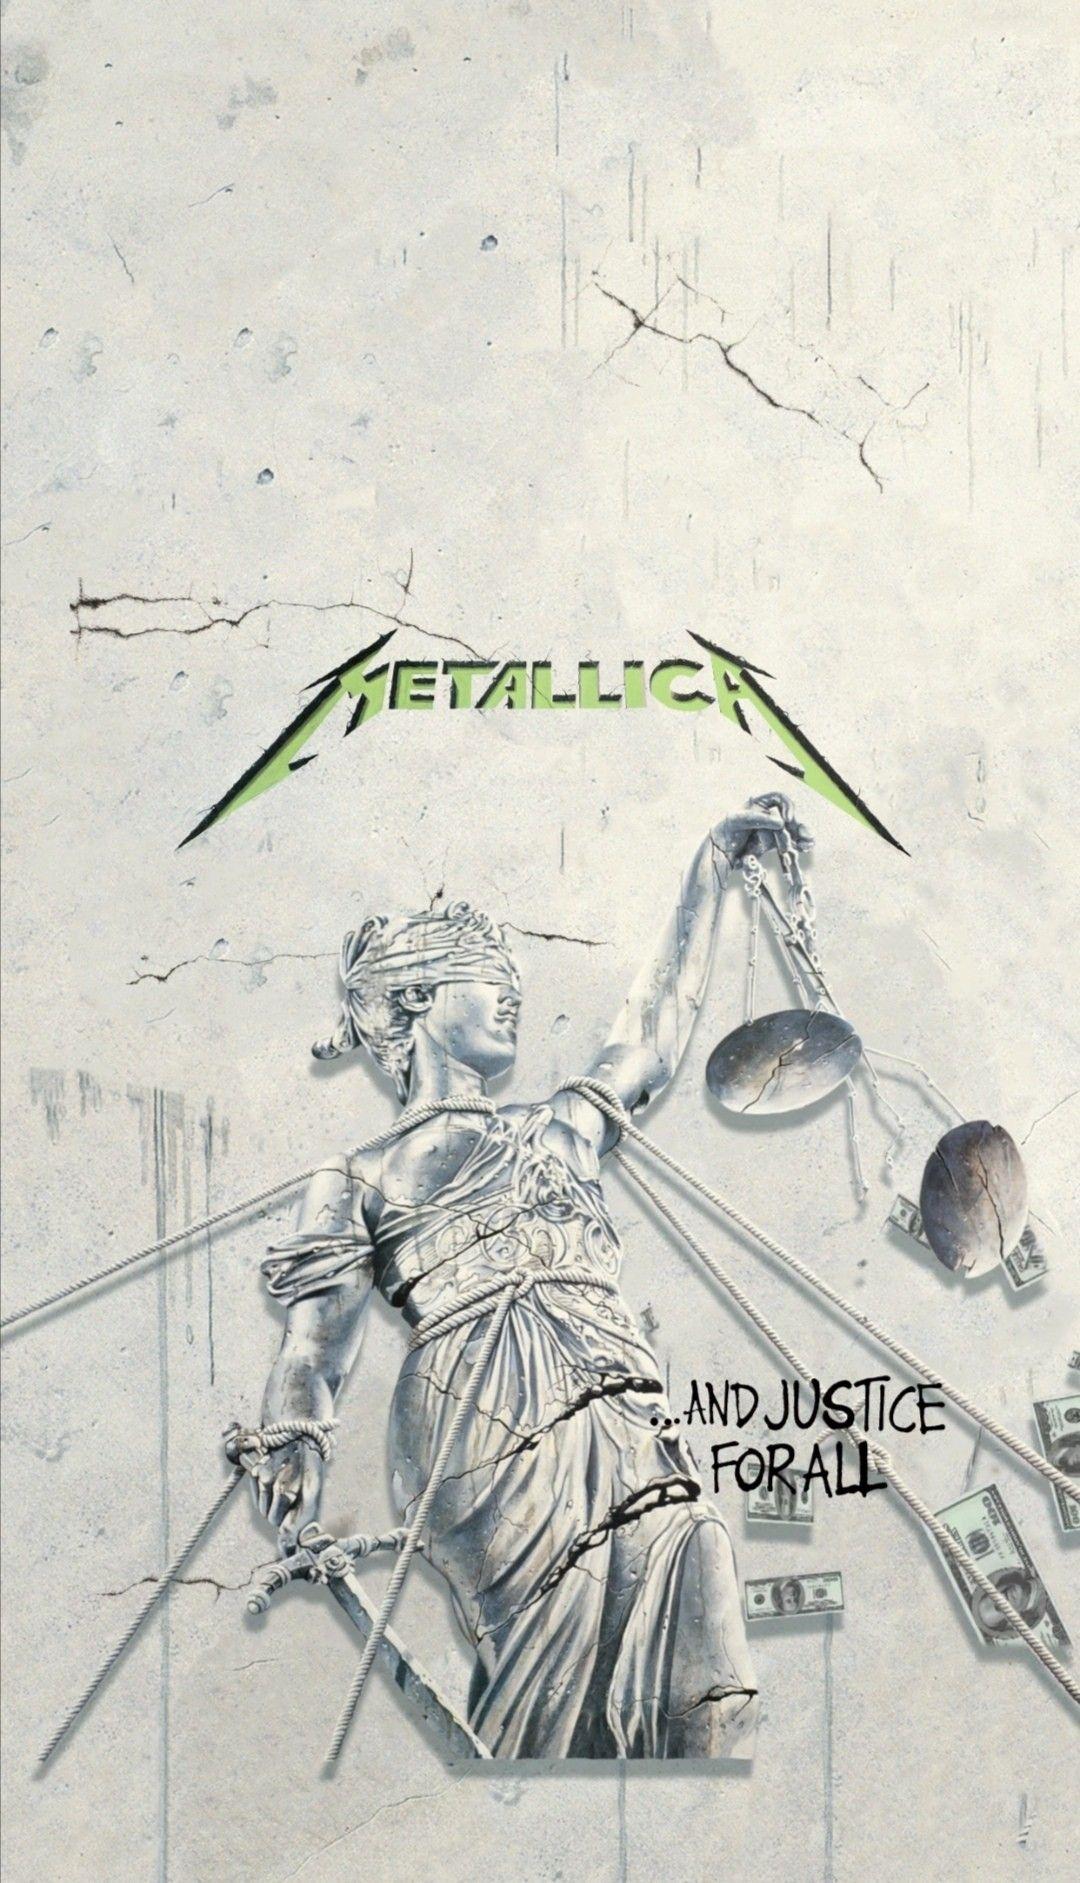 Metallica And Justice For All Wallpaper Fondo Iphone Posteres De